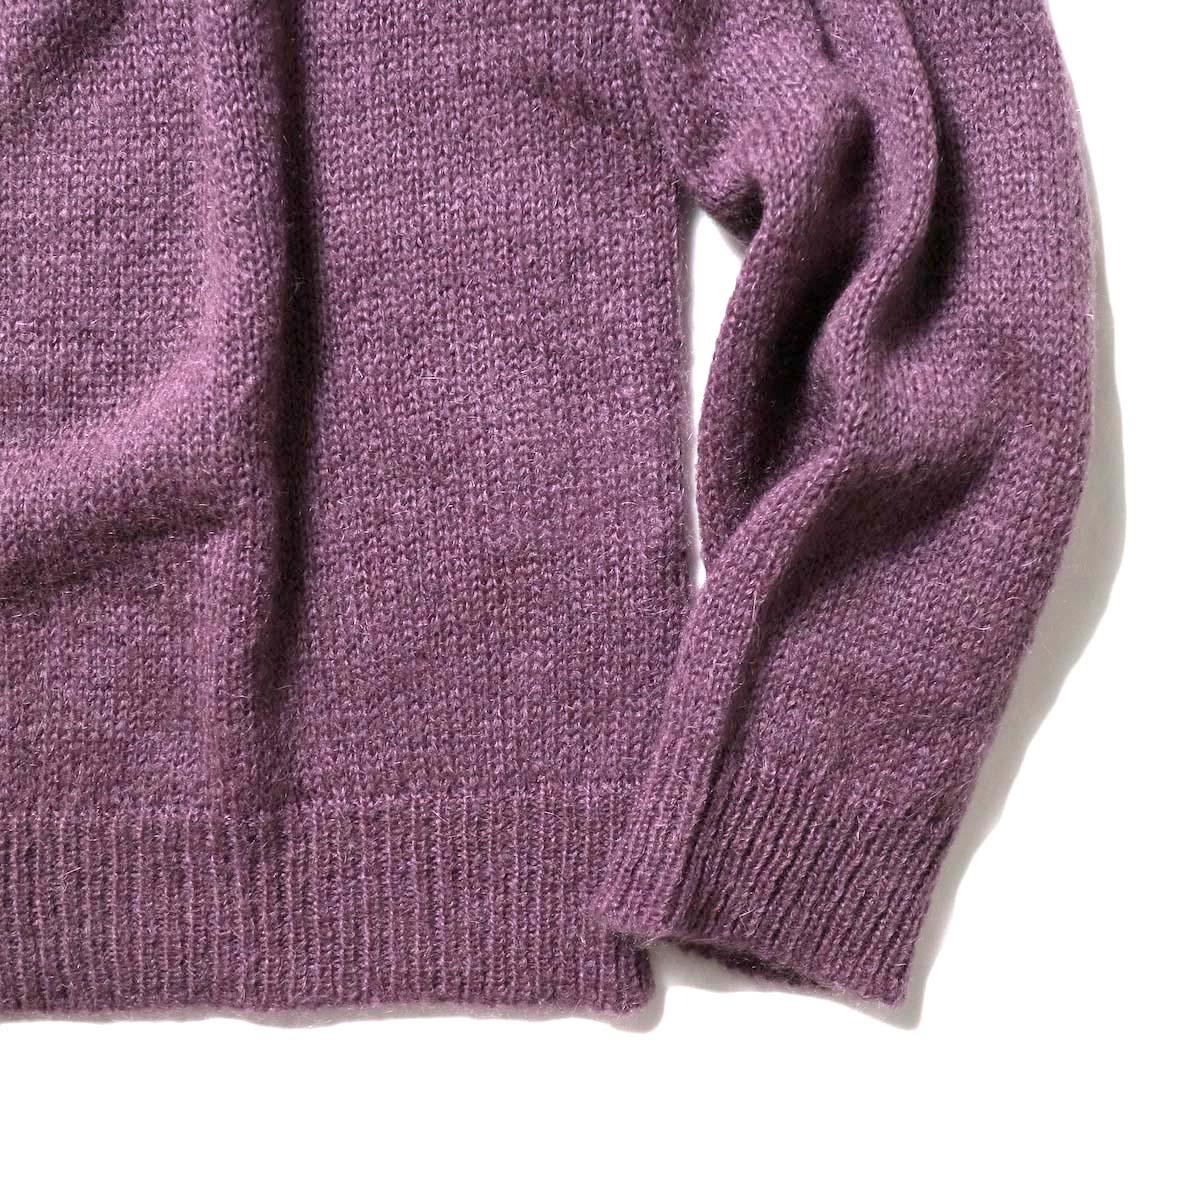 FLAMAND / Mohair Basic (Dark Lavender)袖、裾